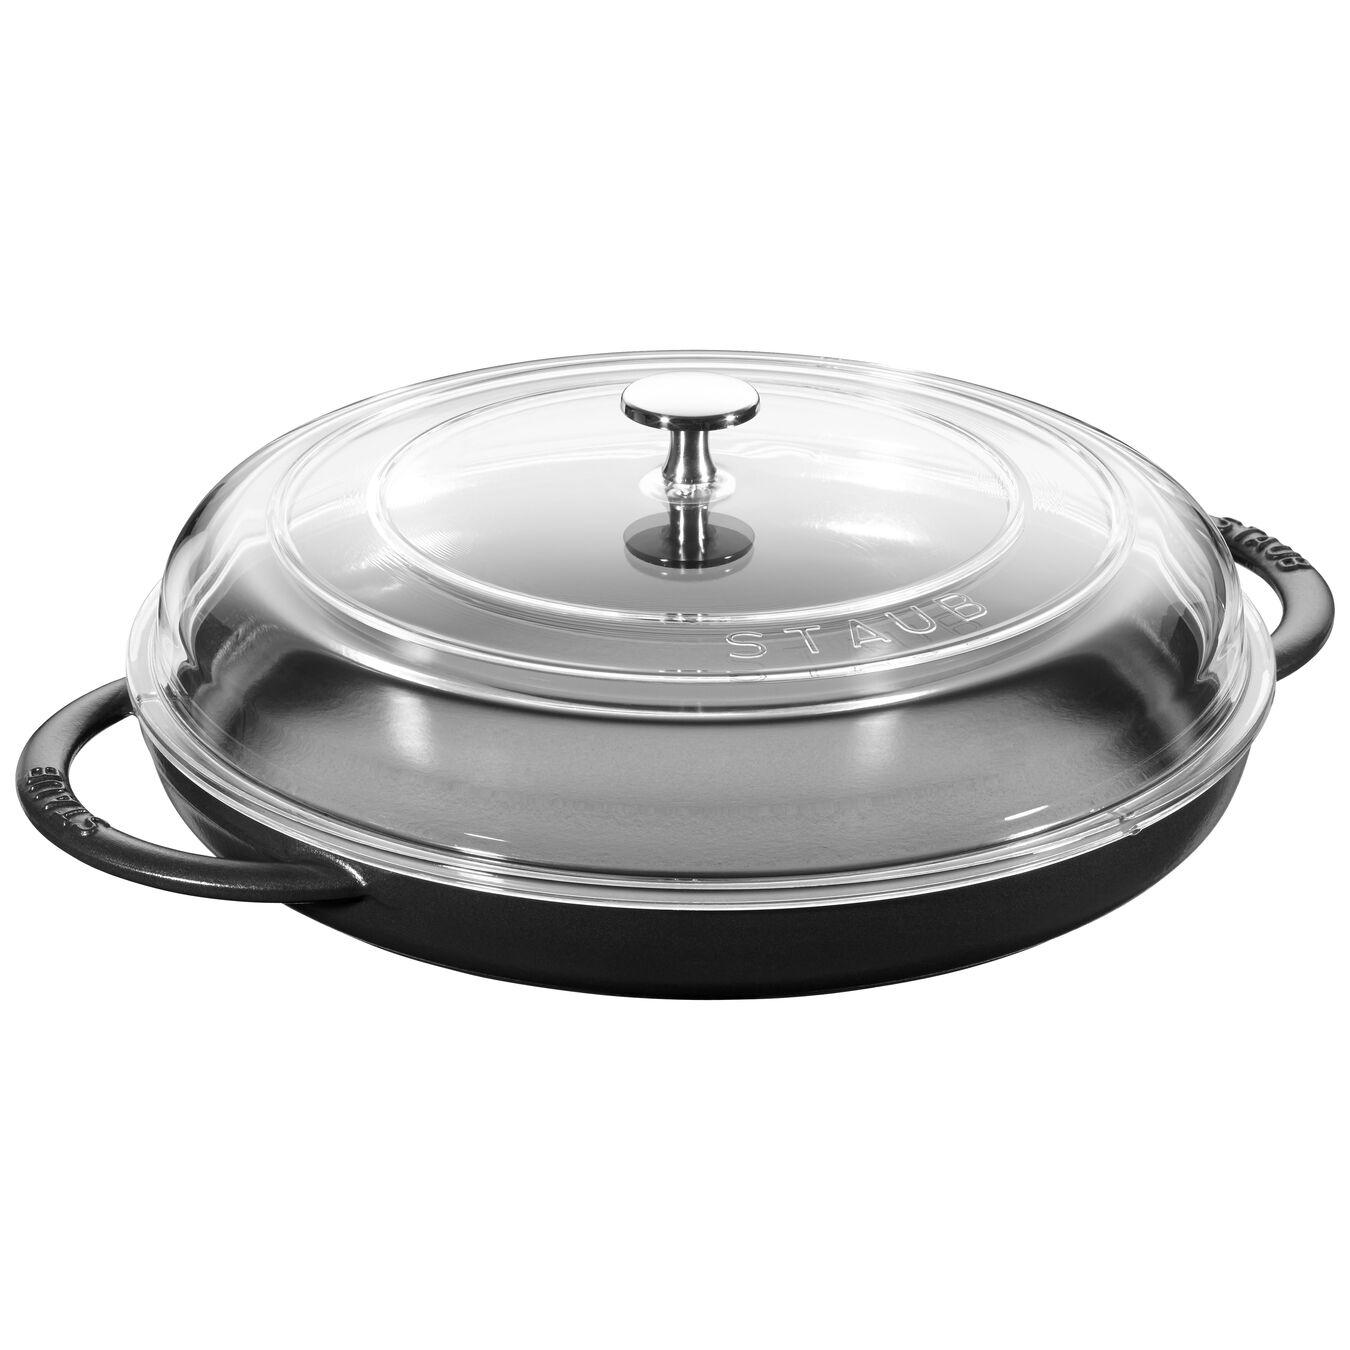 12-inch Round Steam Griddle - Matte Black,,large 1